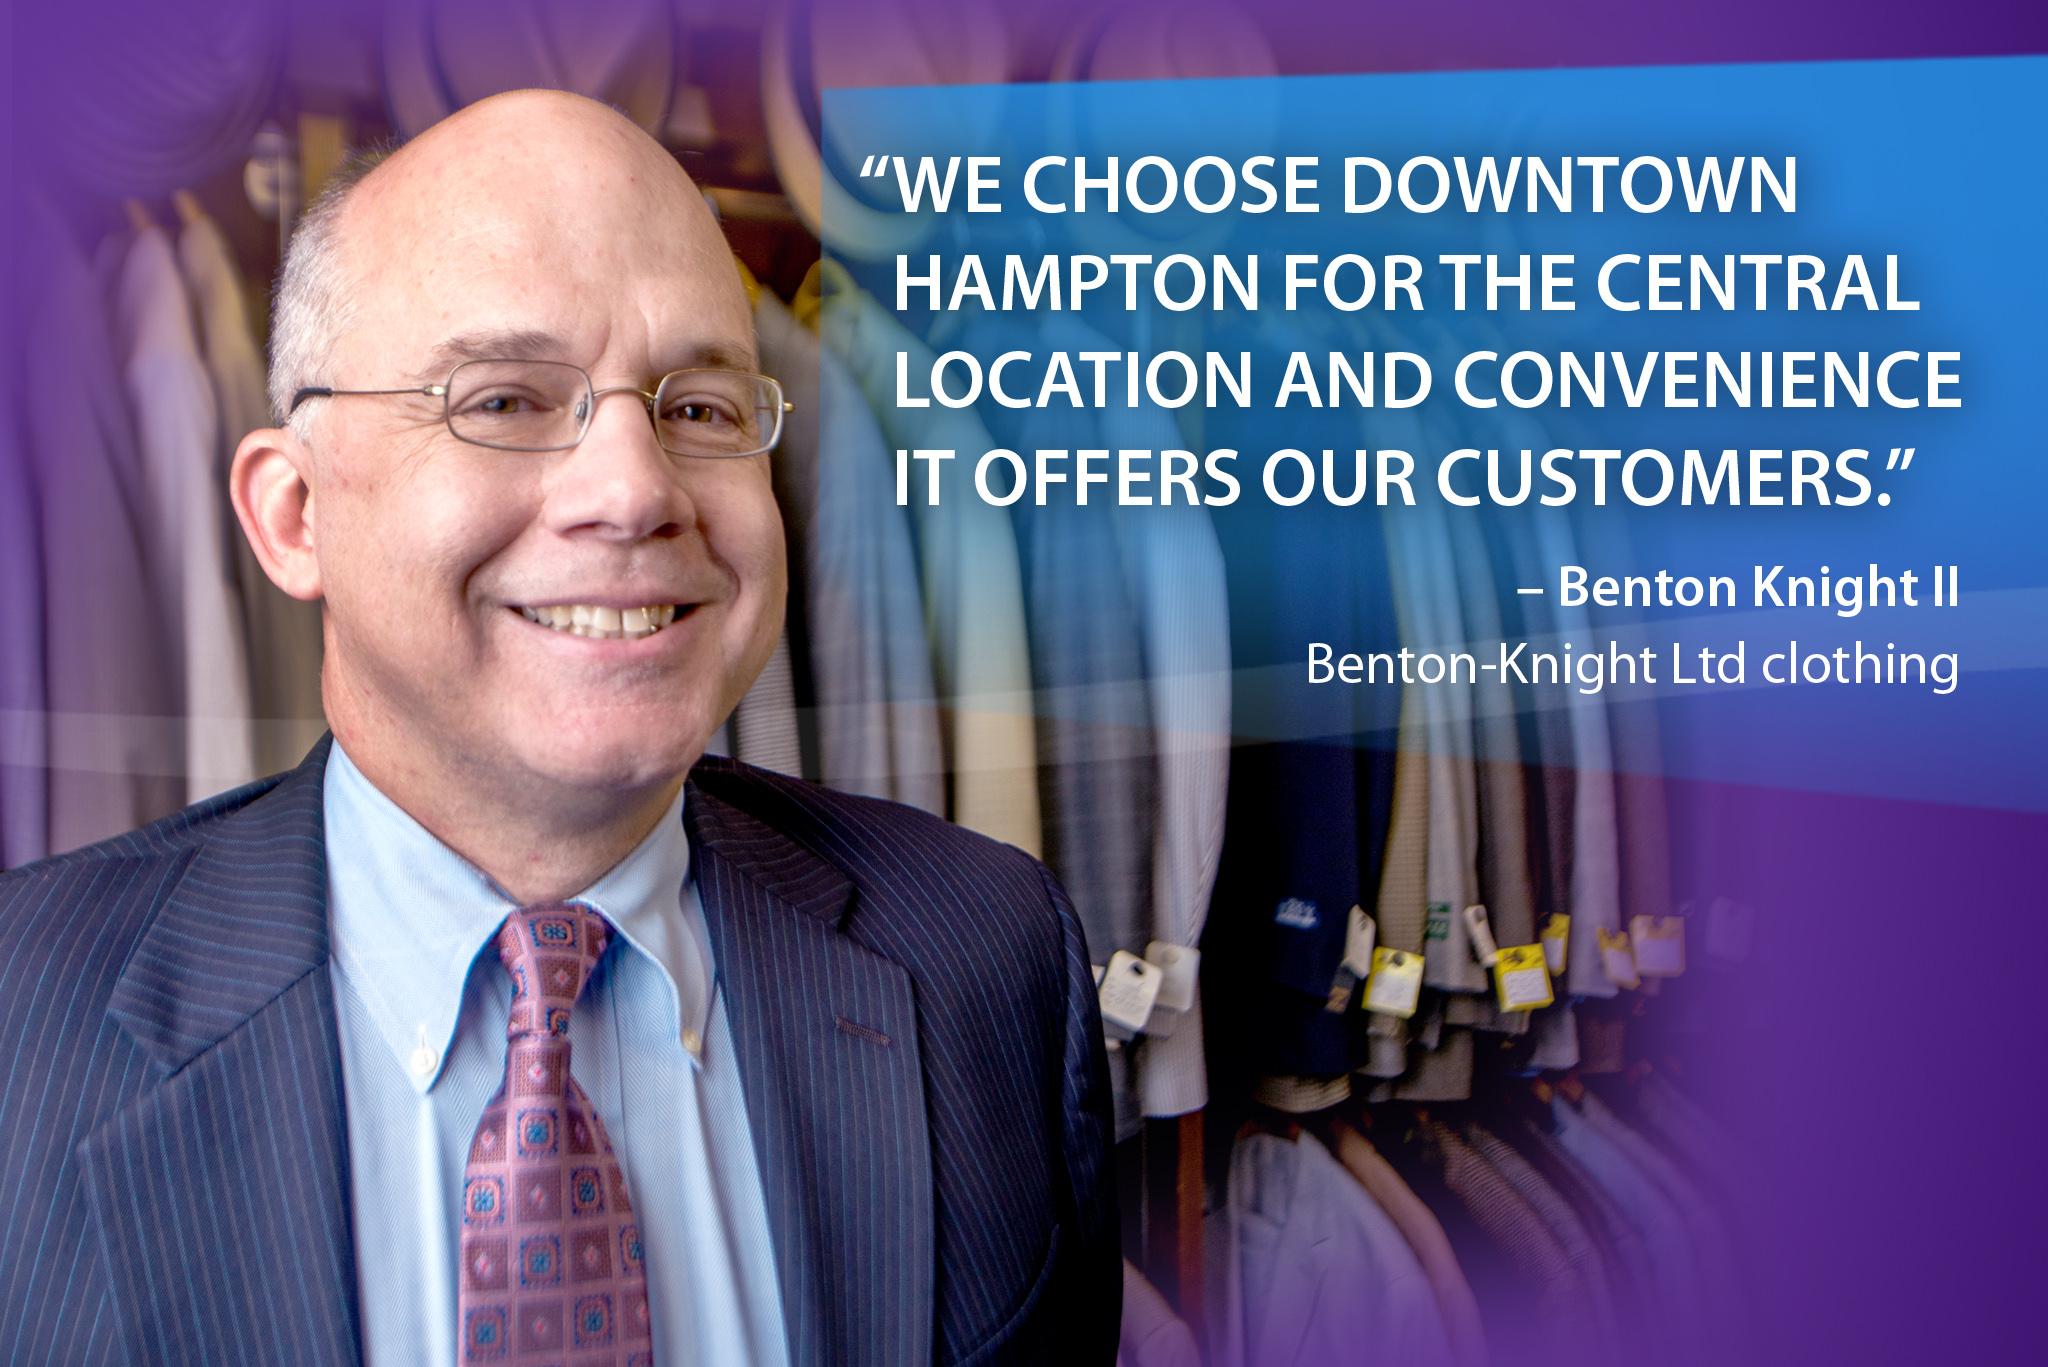 Benton Knight